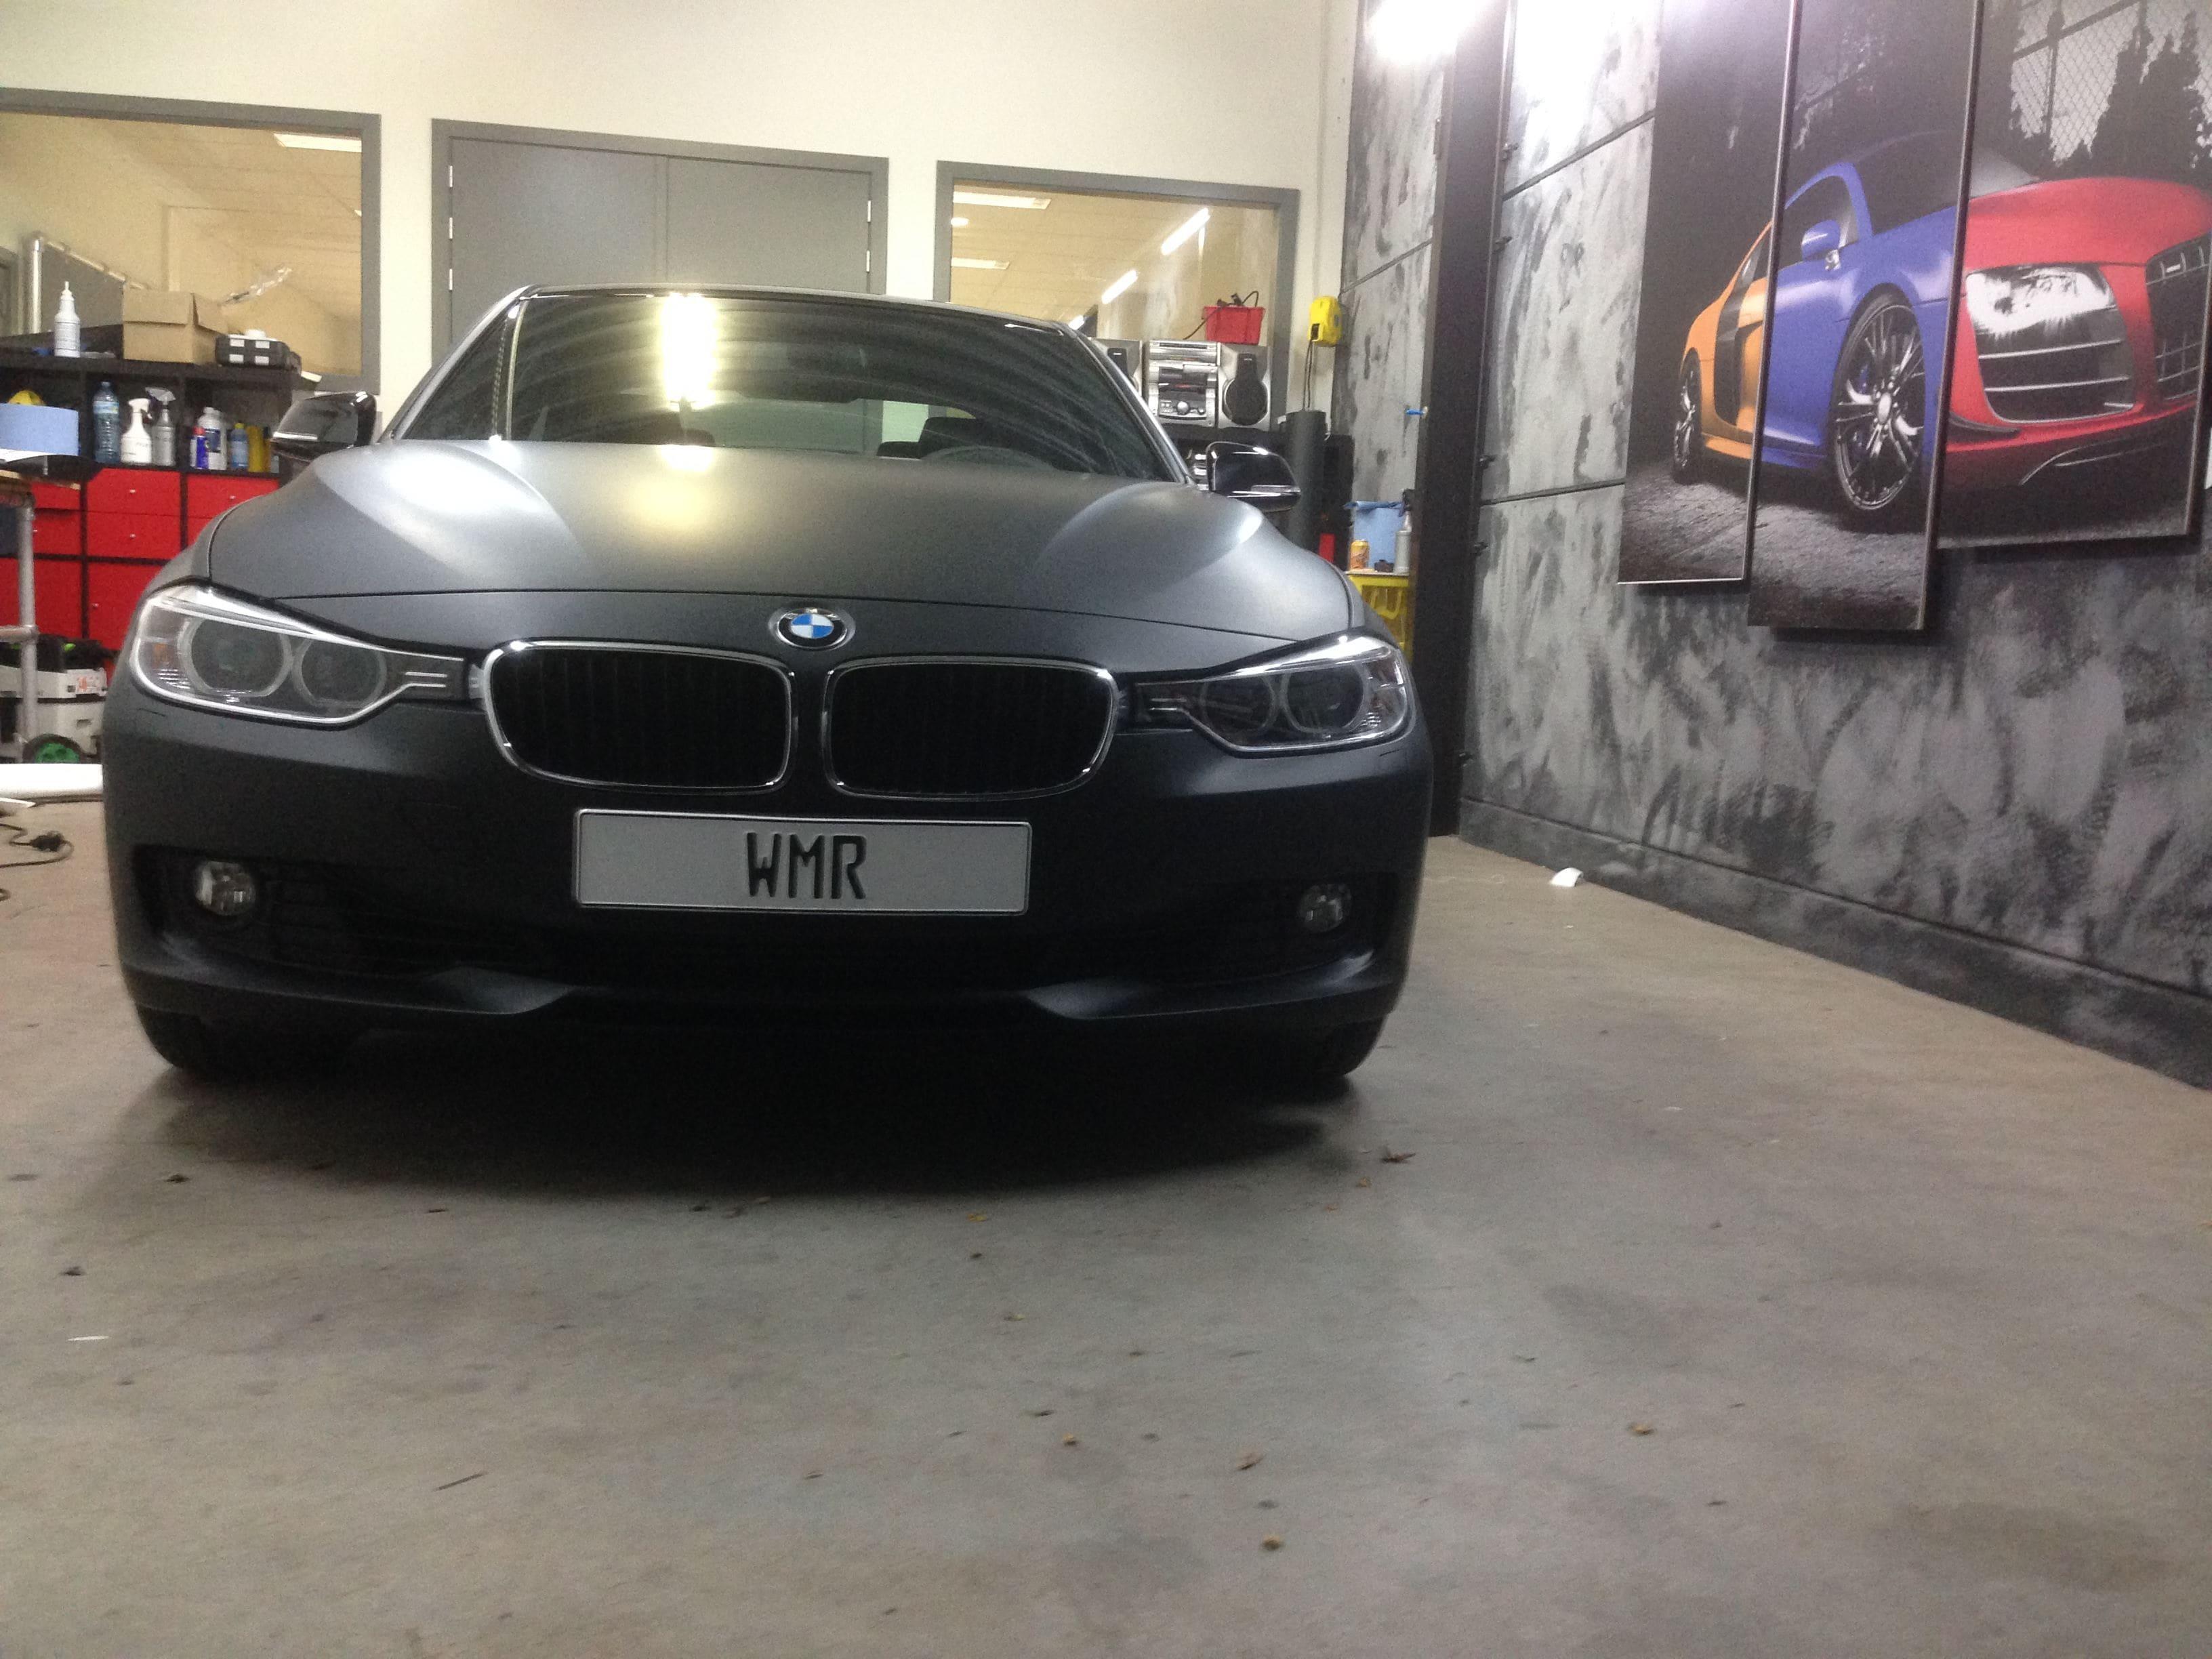 BMW E92 3 Serie met Mat Zwarte Wrap, Carwrapping door Wrapmyride.nu Foto-nr:5419, ©2021